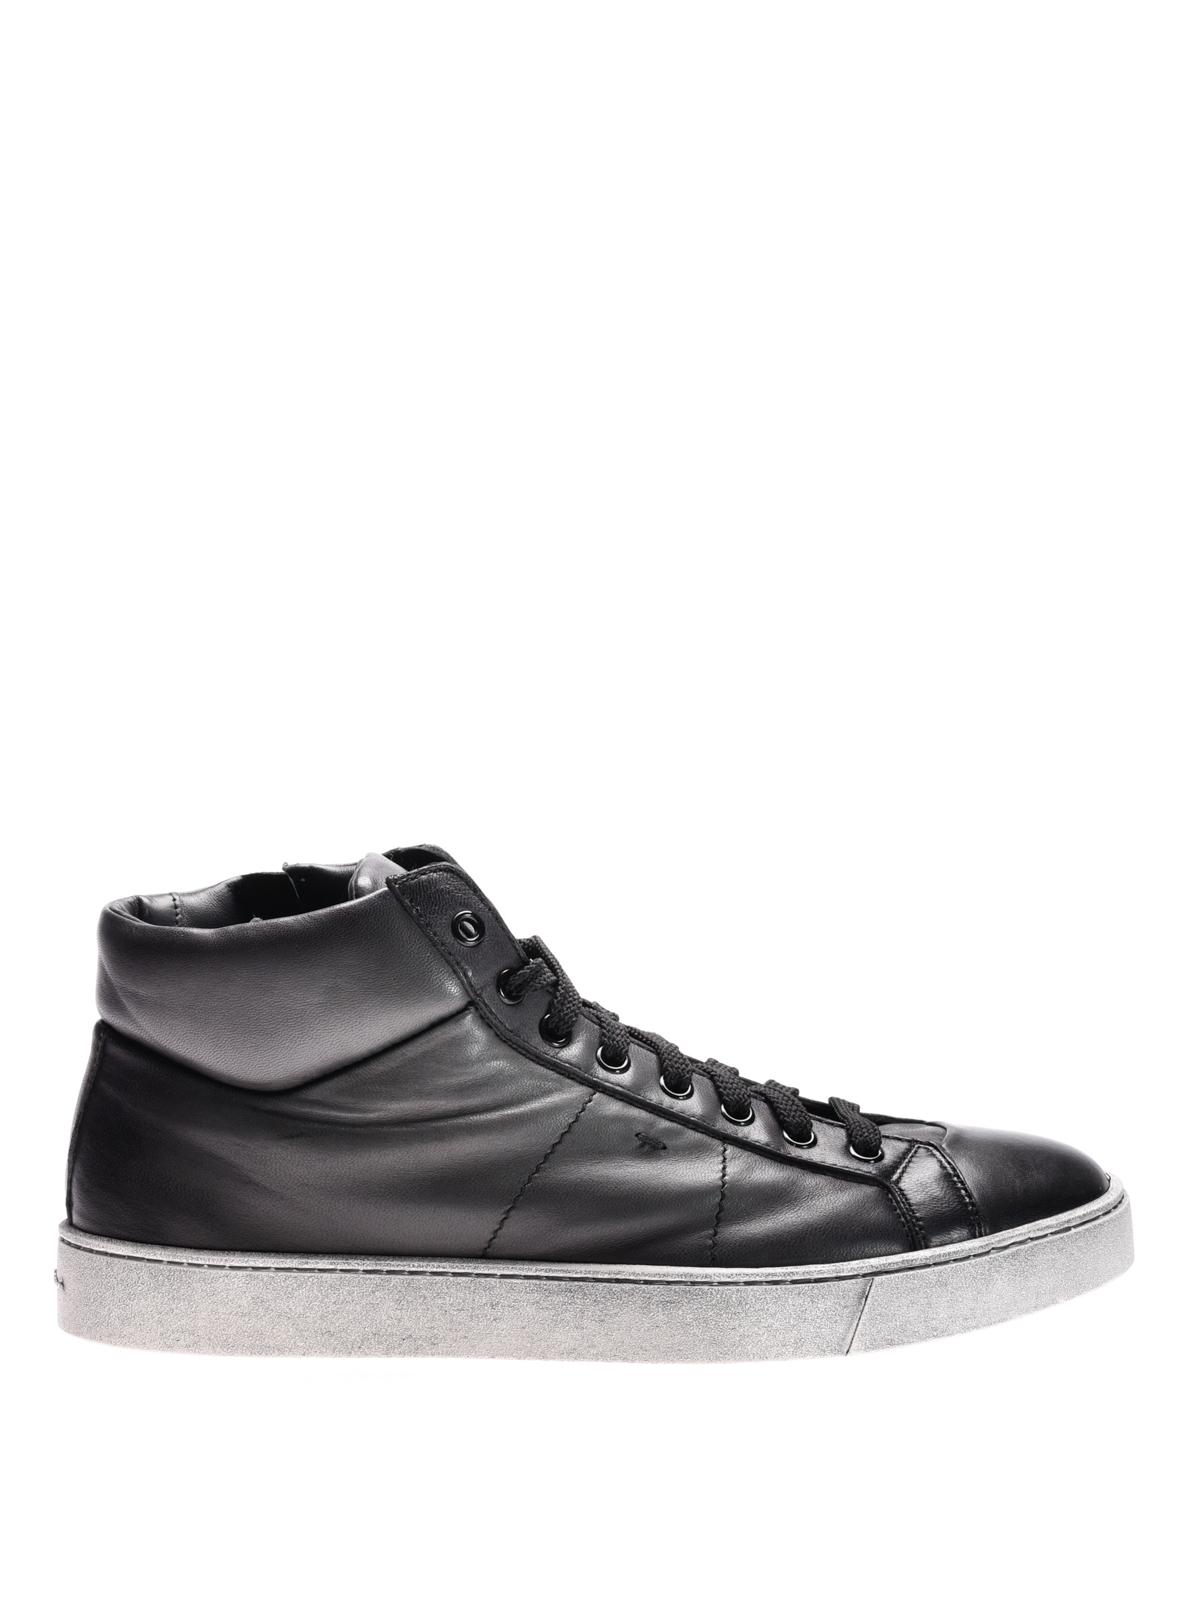 Santoni - Sneaker alte in pelle - sneakers - MBGU20532PASRGOOG62 4db2e504a04